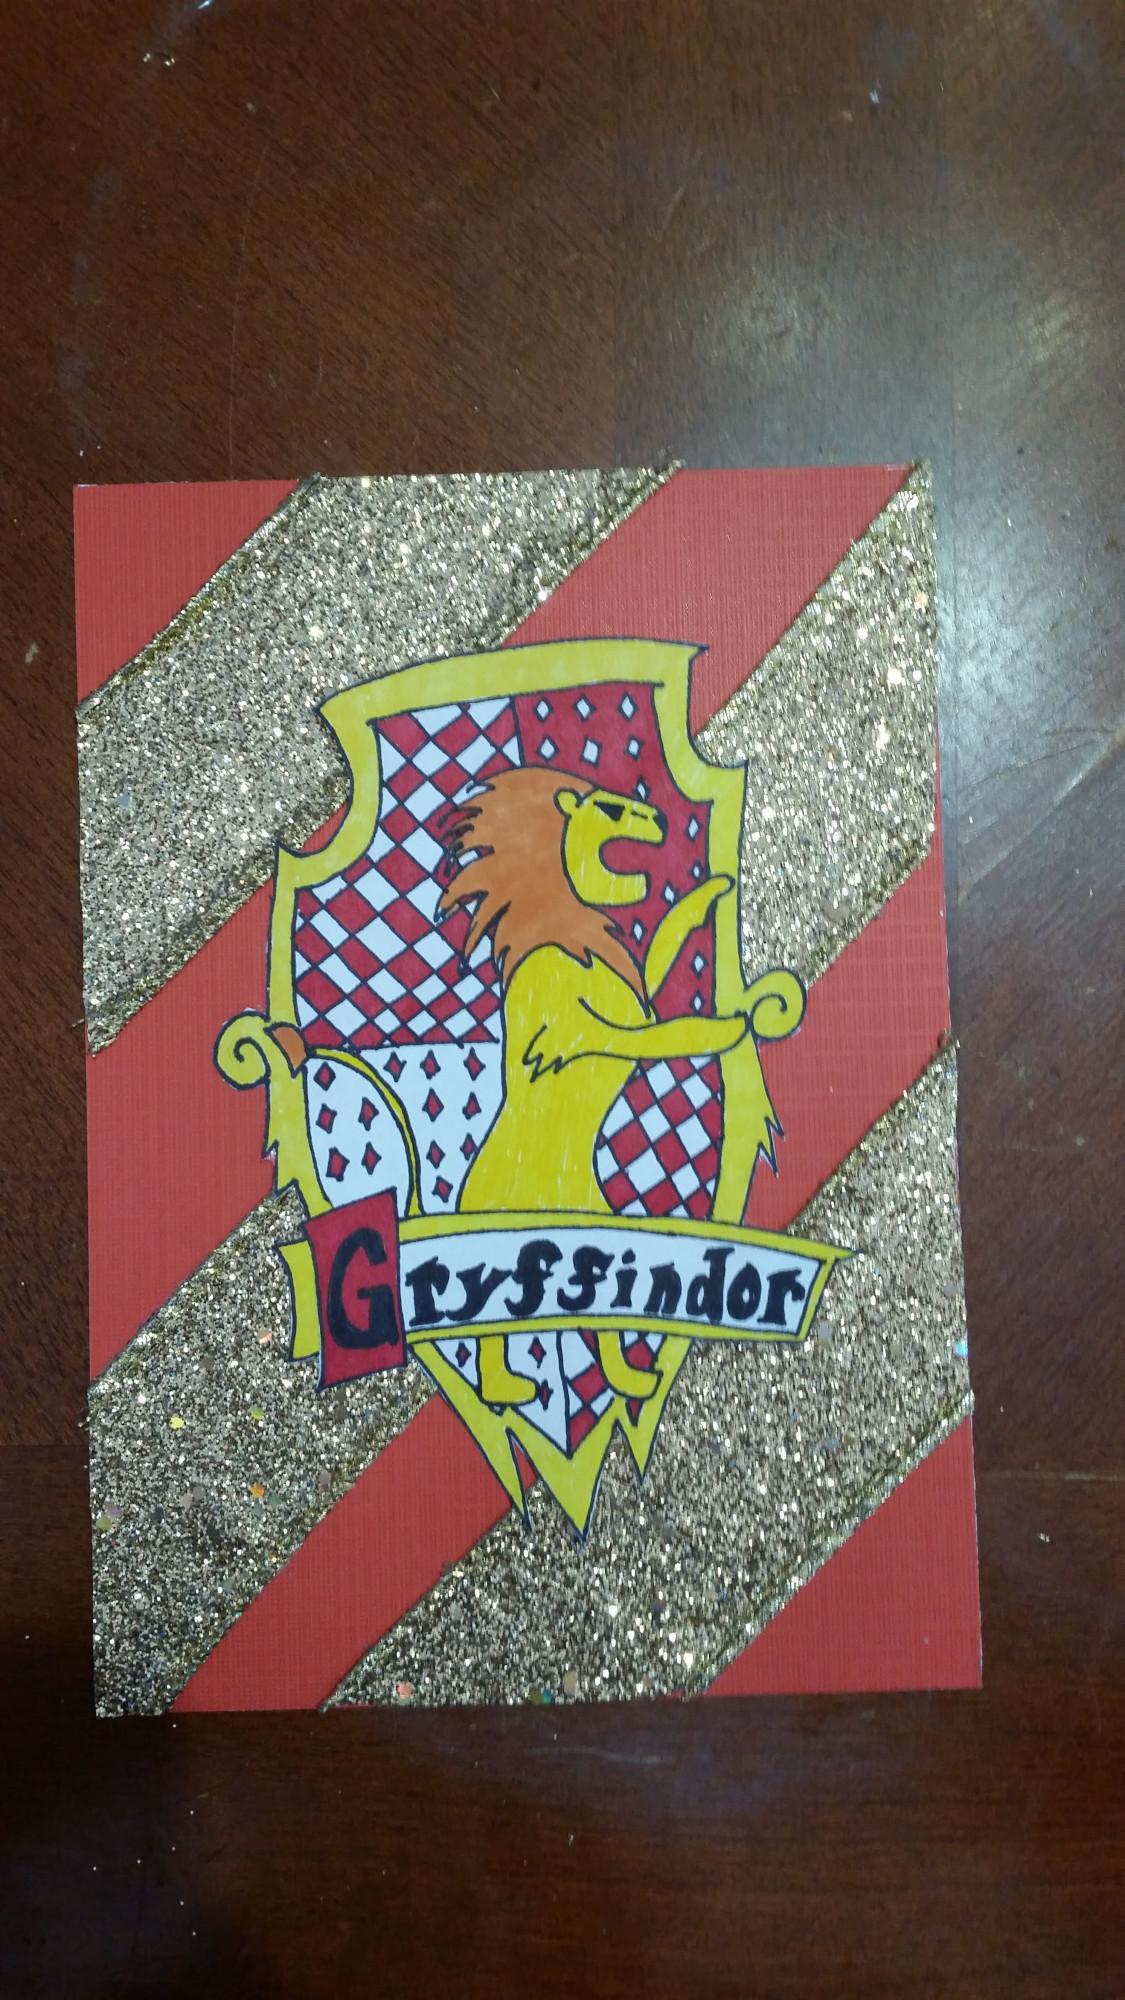 Hogwarts Wappen Zum Ausdrucken Genial Harry Potter Trocken Löschen Board Gunook Stock